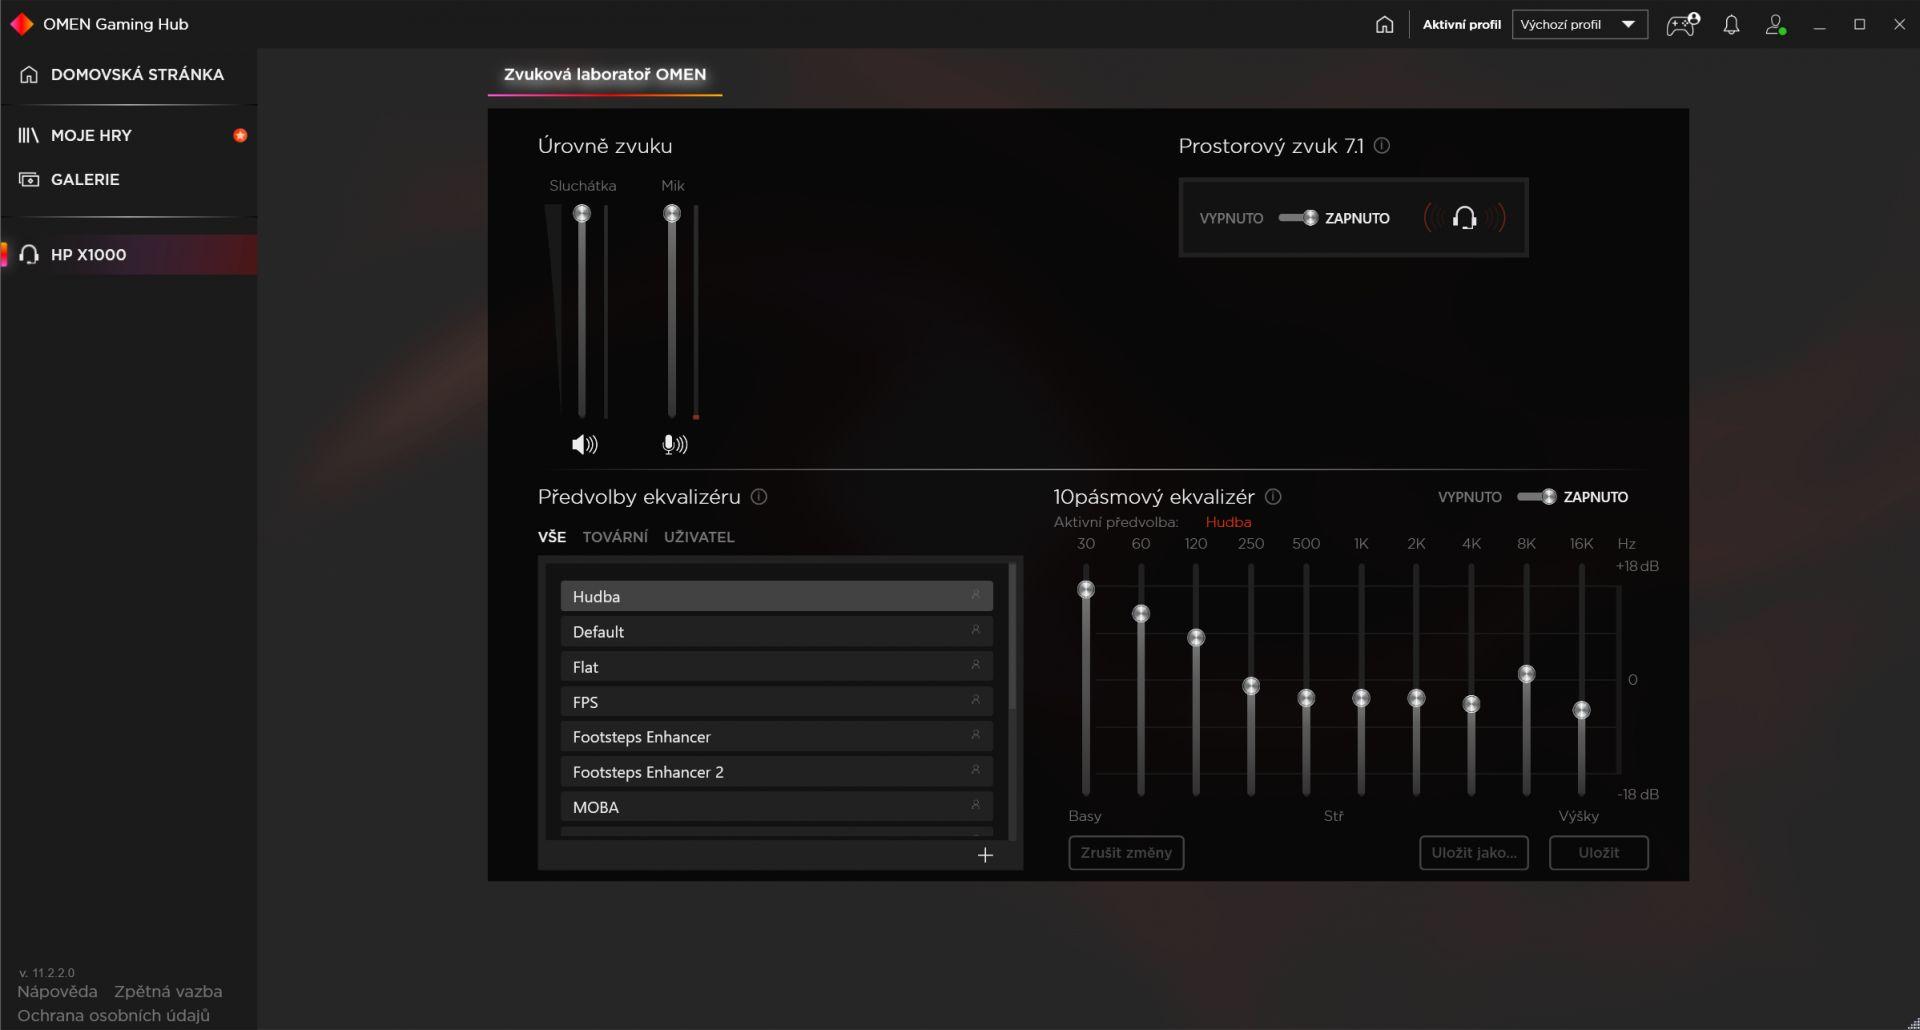 Nastavení ekvalizéru v OMEN Gaming Hub